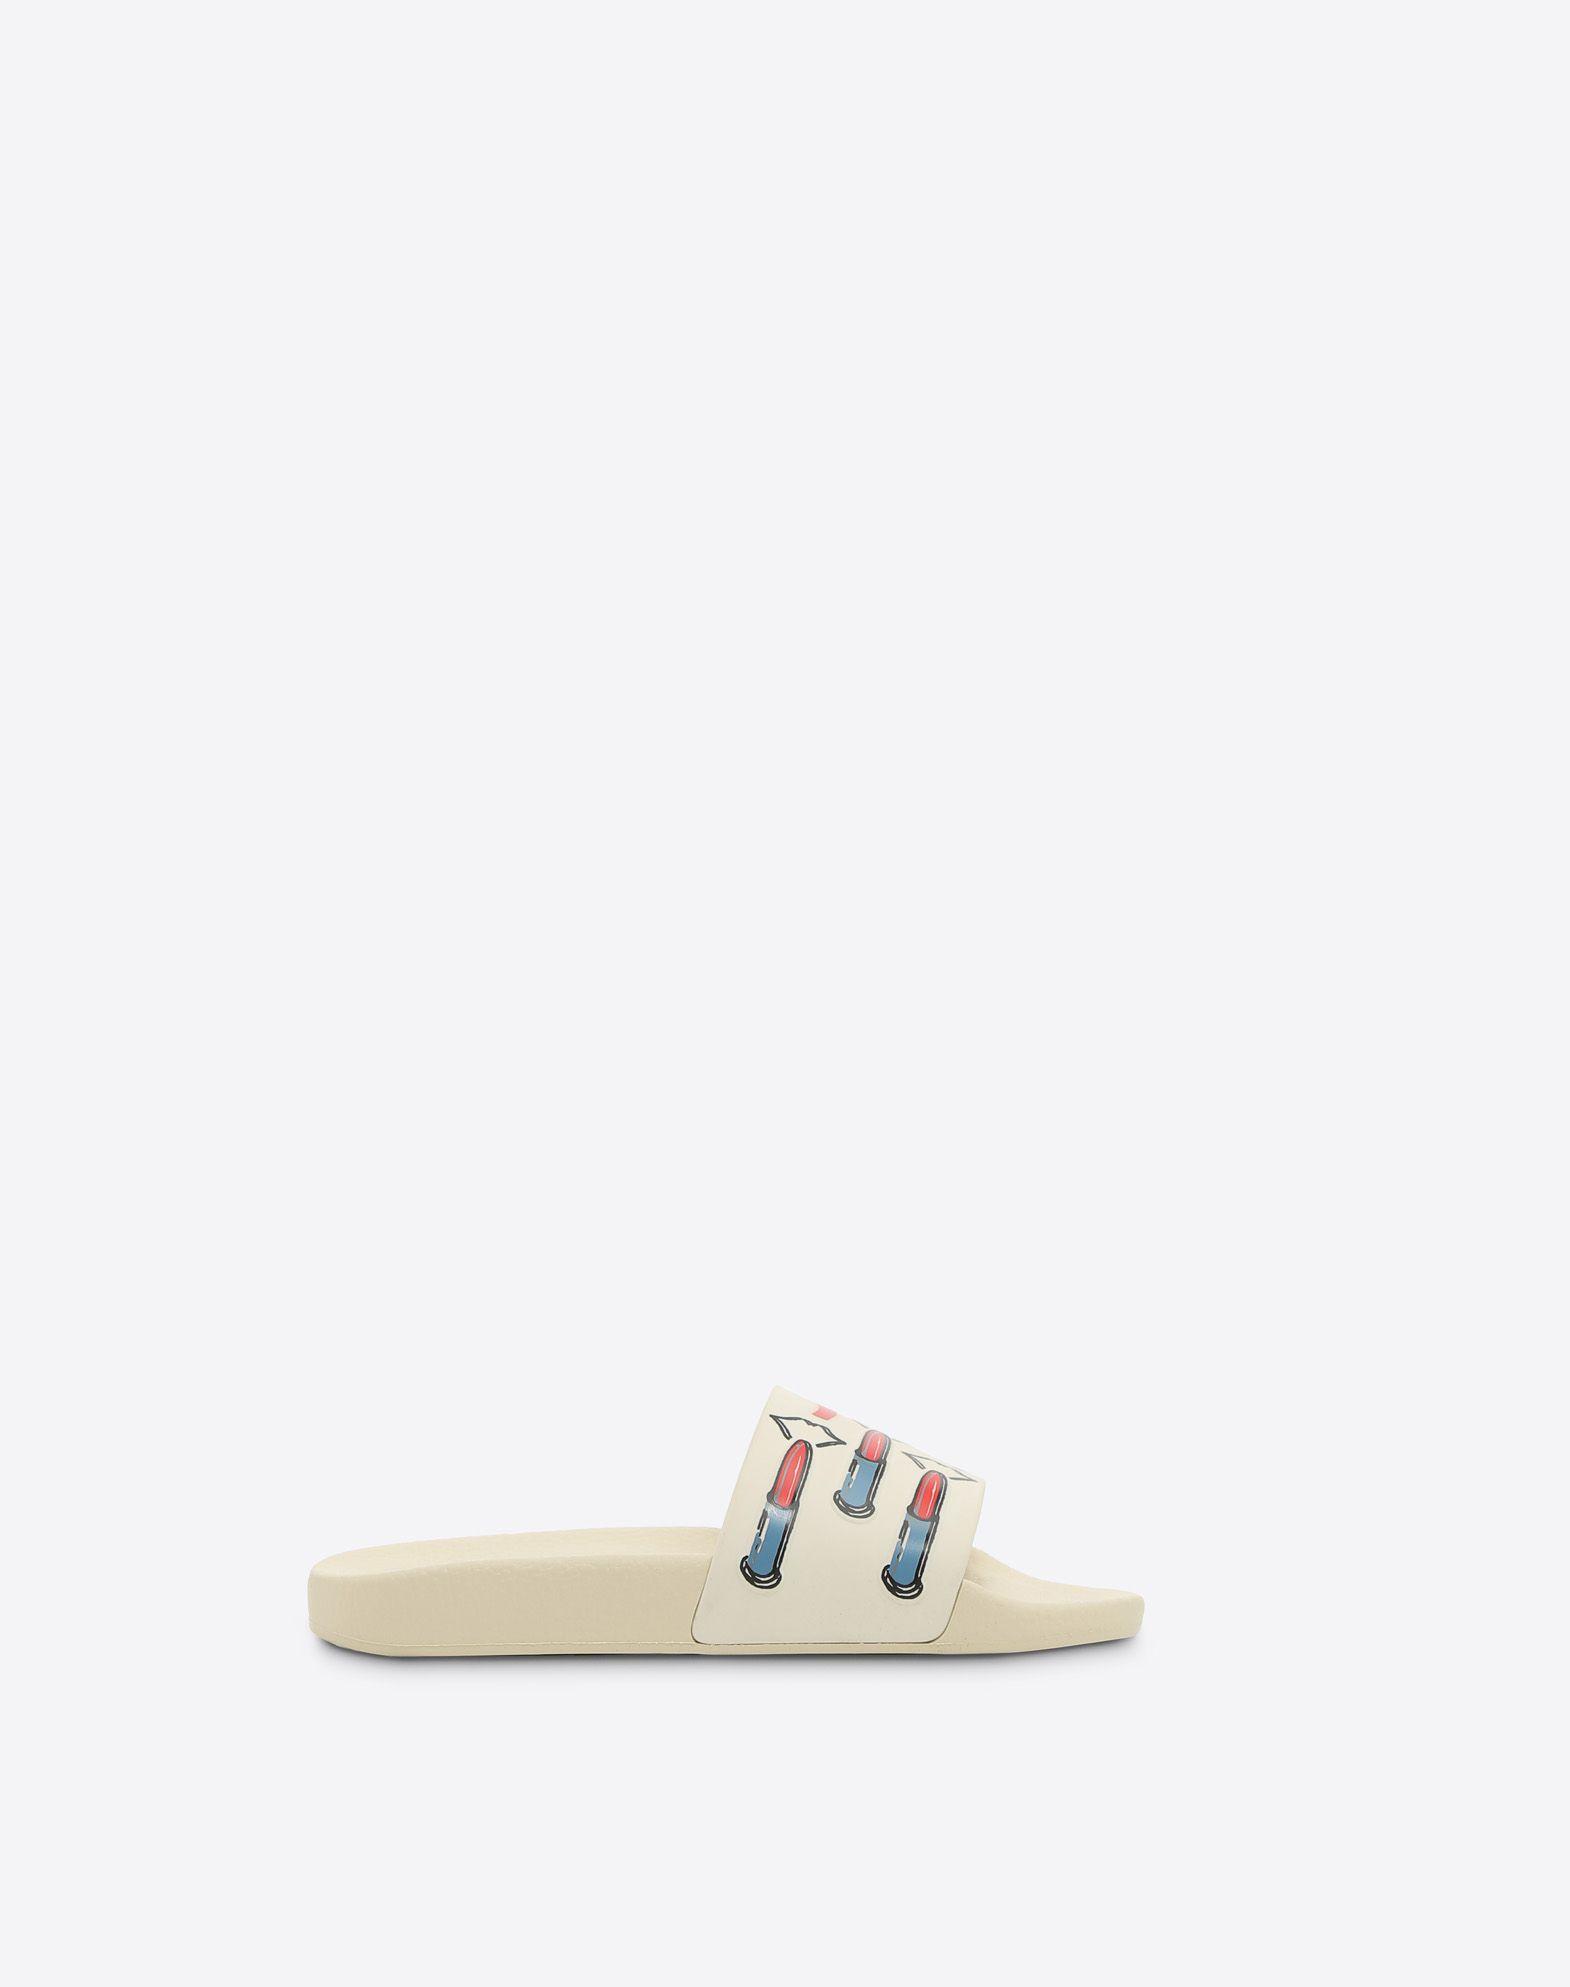 VALENTINO GARAVANI 口红印纹 PVC 拖鞋式凉鞋 拖鞋式凉鞋 D f